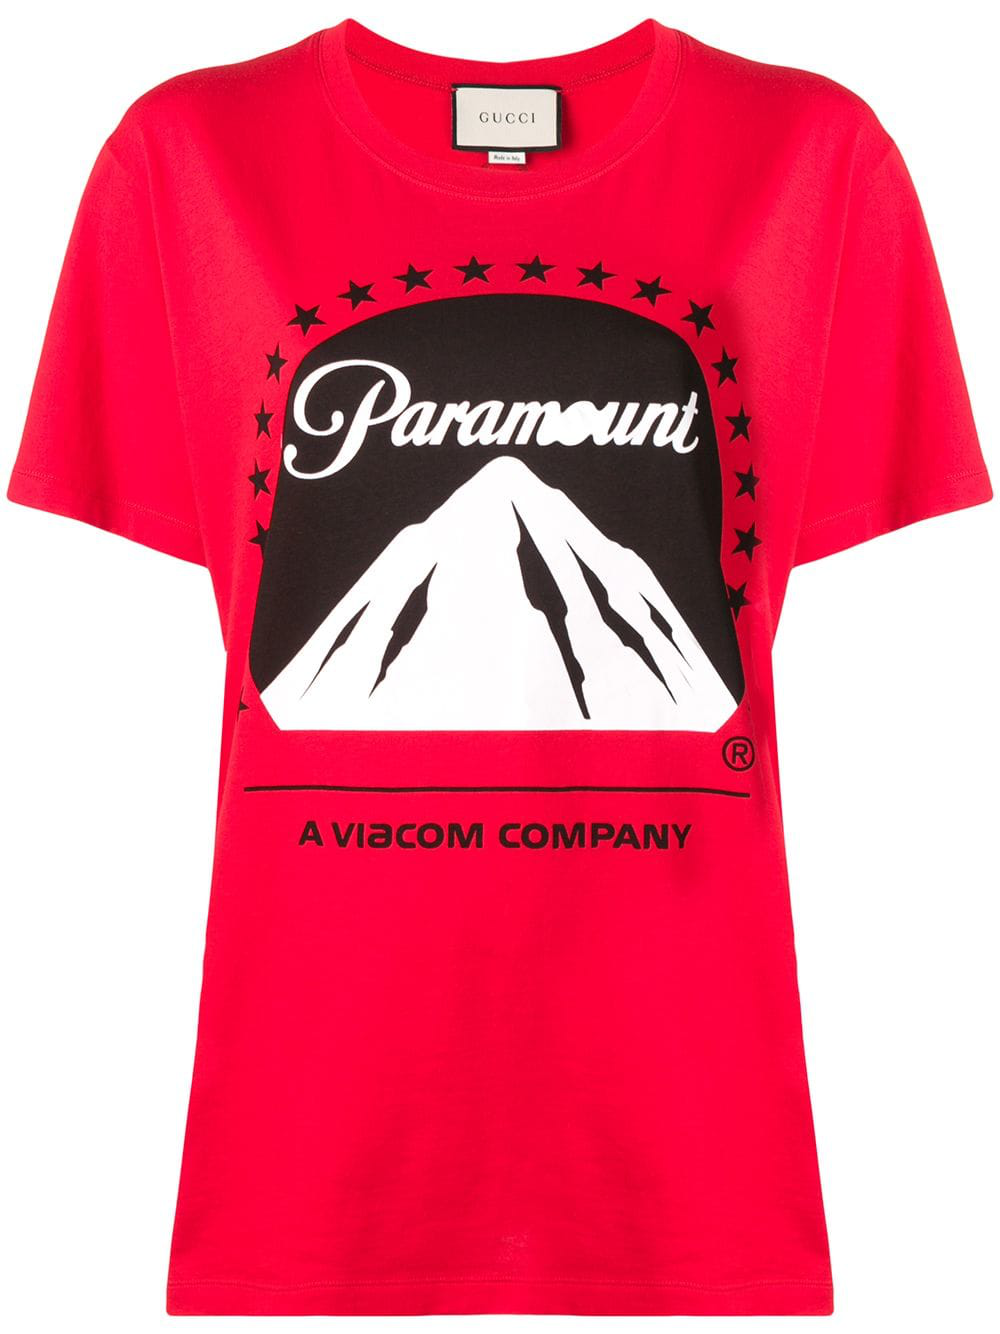 7349072d8 Gucci Paramount Logo T-Shirt - Red | ModeSens